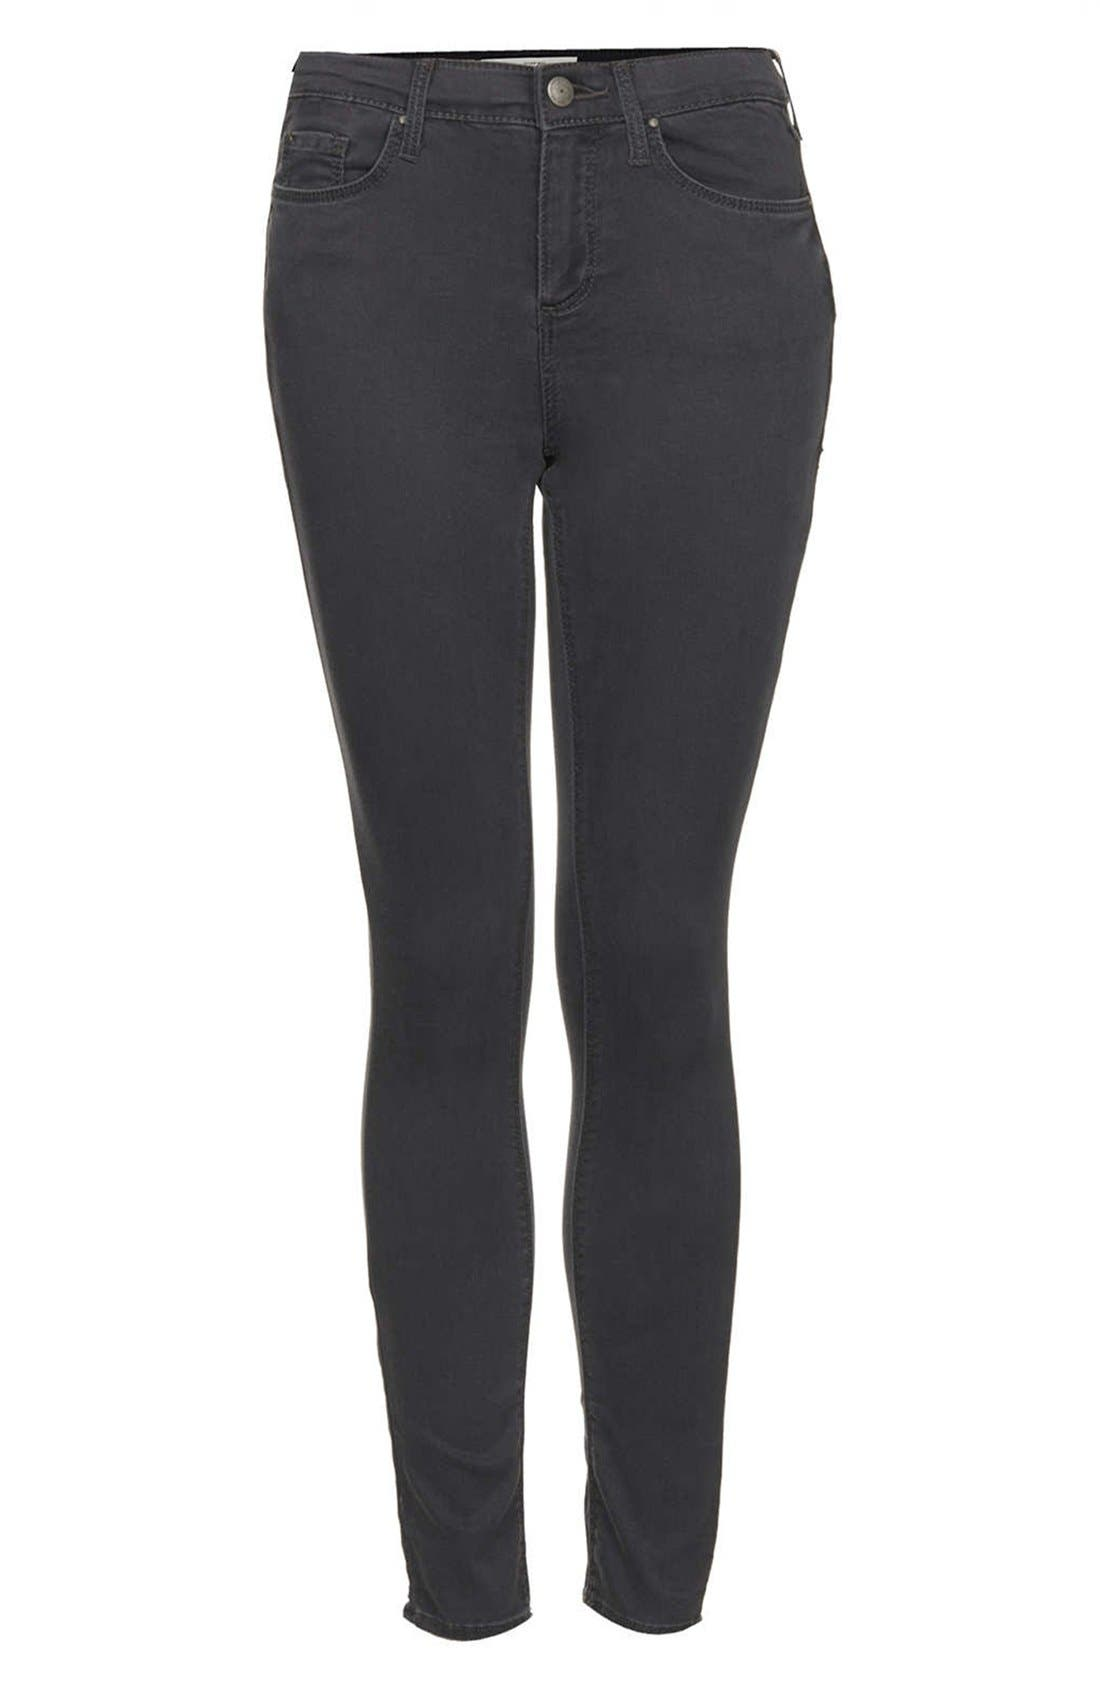 Alternate Image 3  - Topshop Moto 'Leigh' Skinny Jeans (Regular & Short)